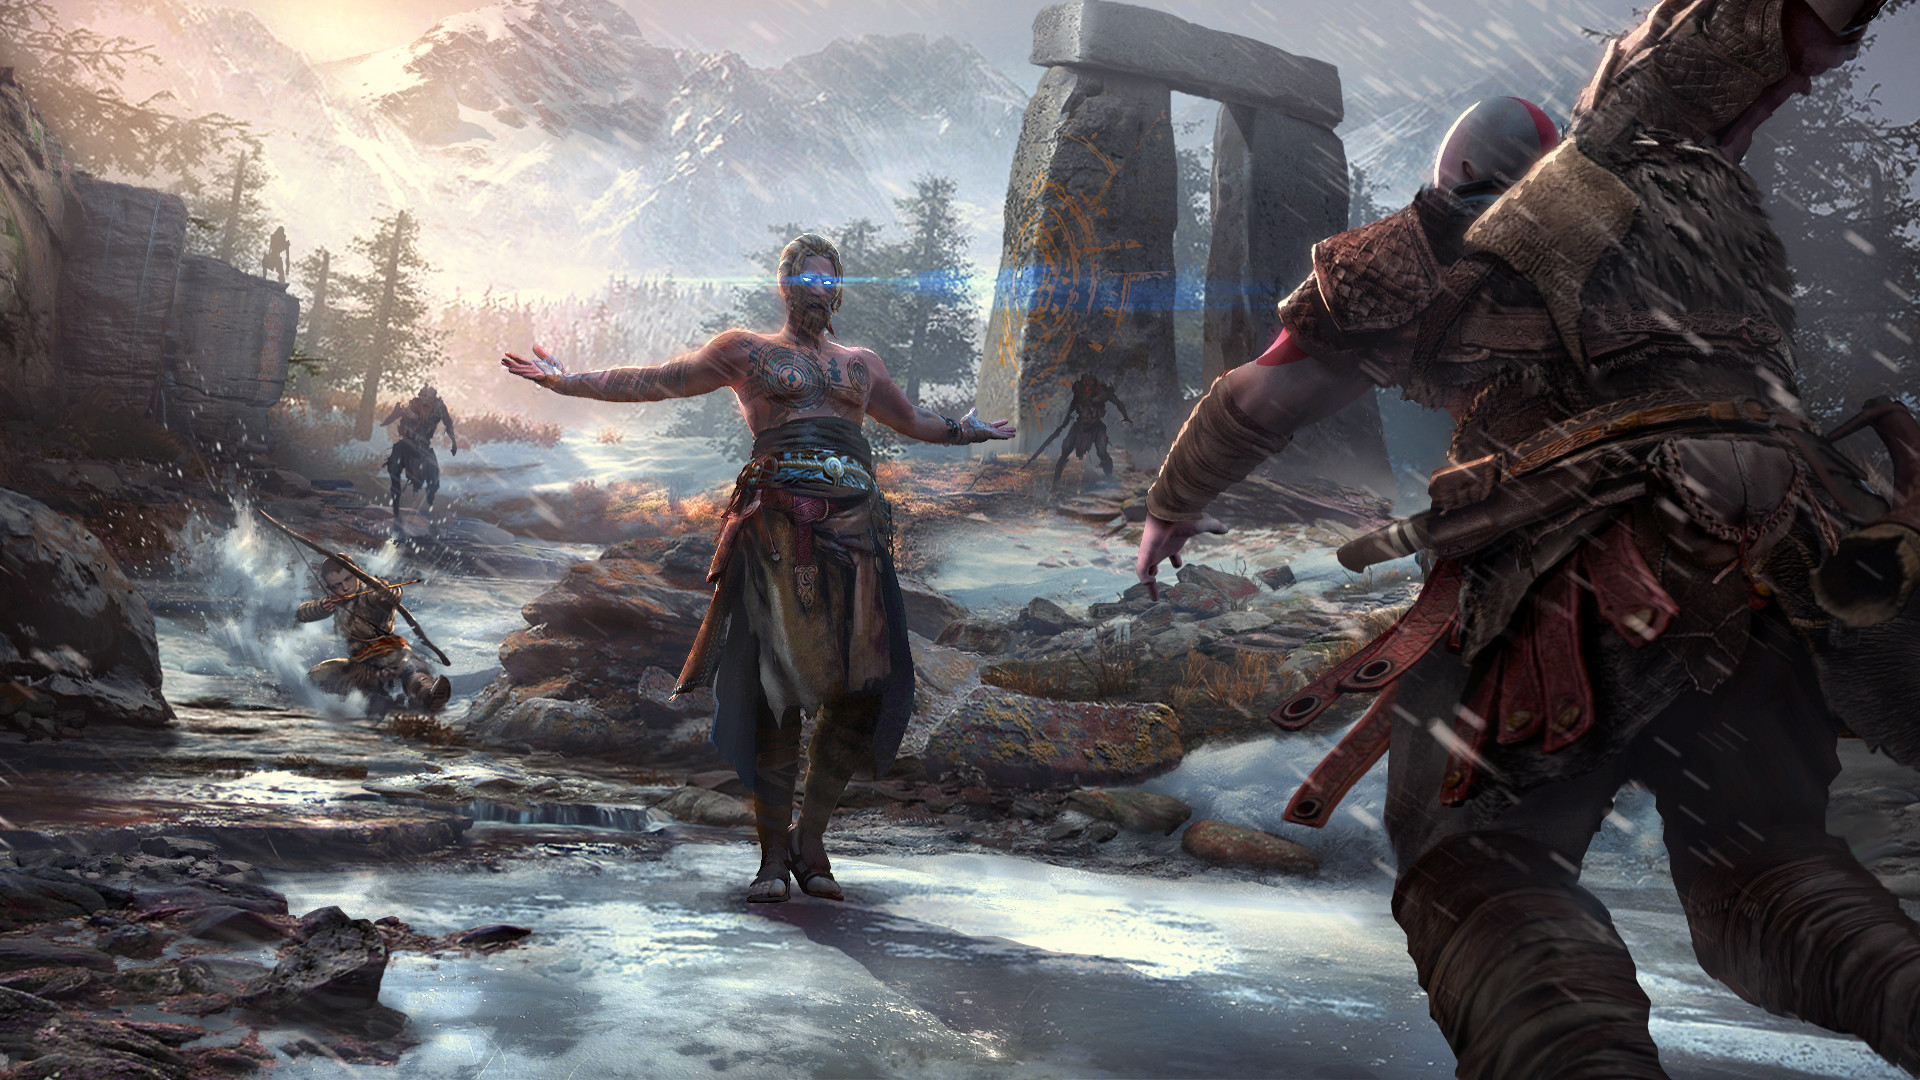 God Of War 2018 Hd Wallpaper Background Image 1920x1080 Id